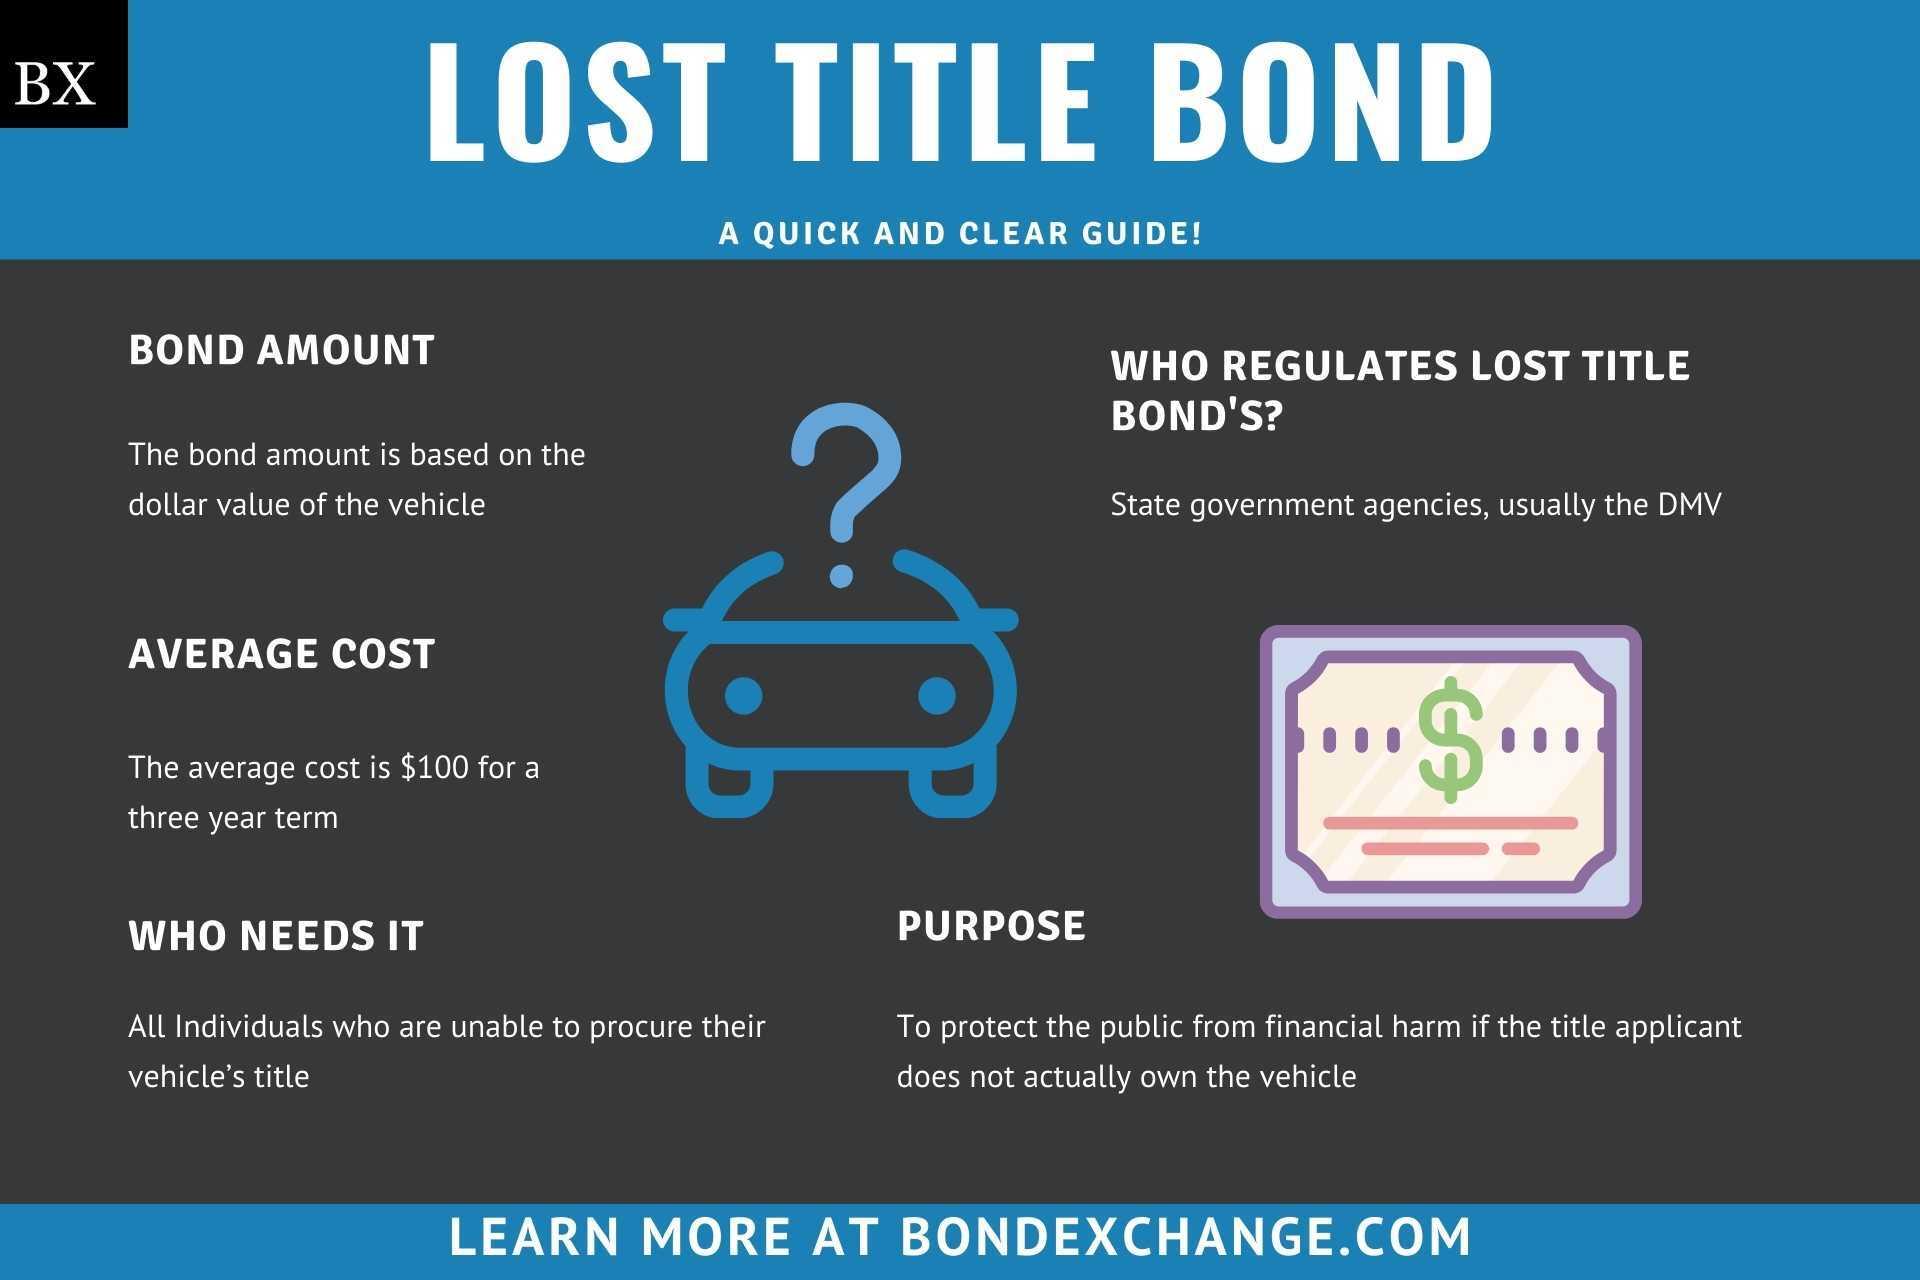 Lost Title Bond